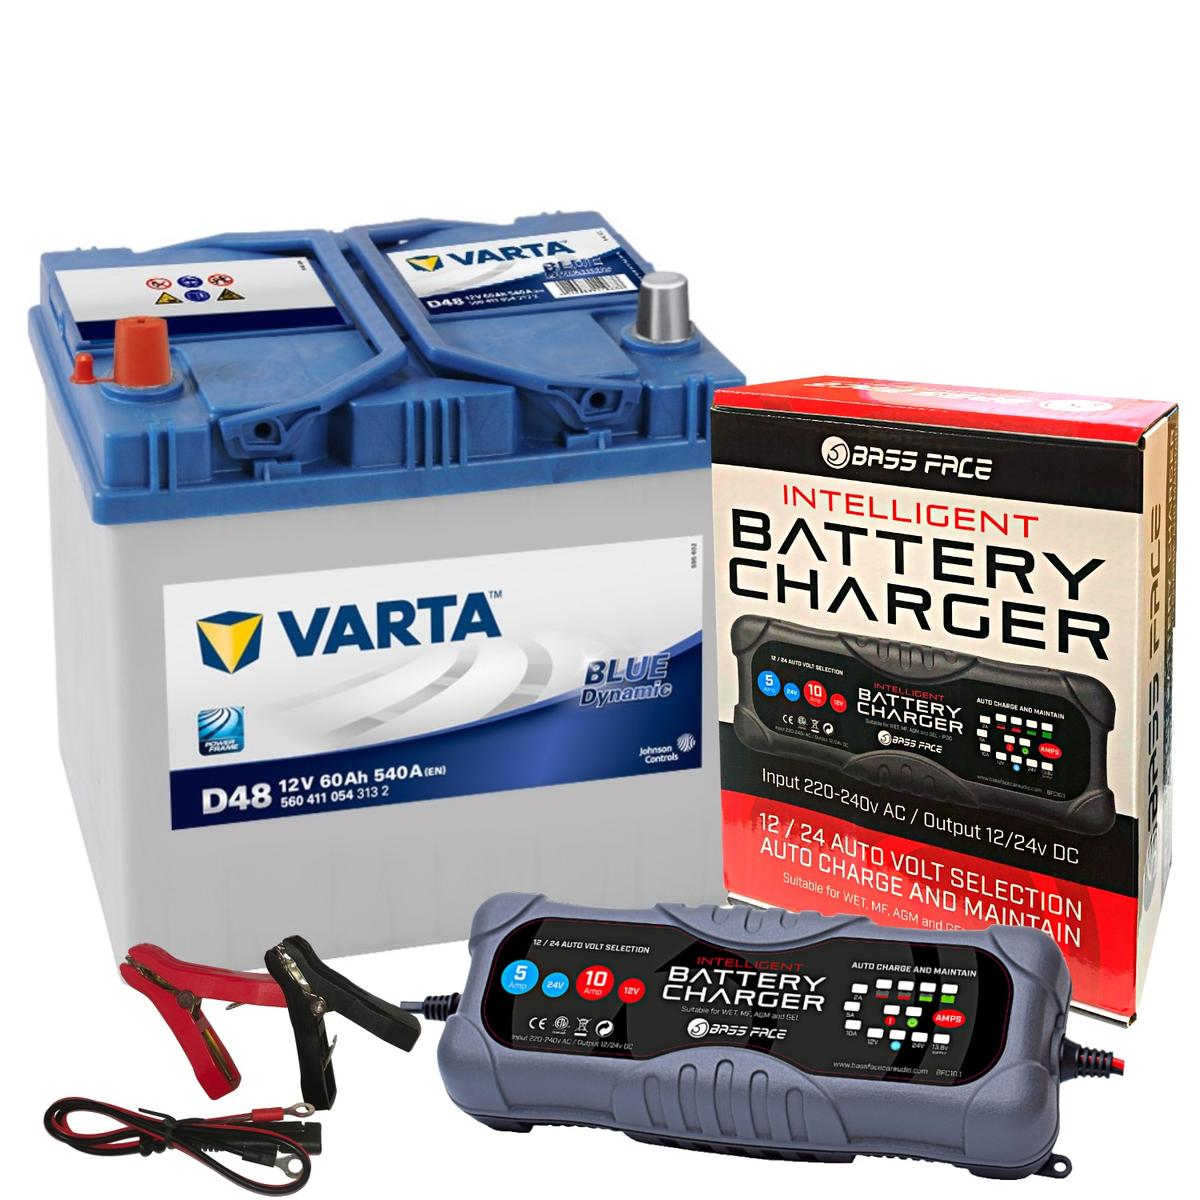 Varta D48 Subaru Car Battery 12v 4 Year 014 / 005R 60Ah 540CCA W/ 10 Amp Charger